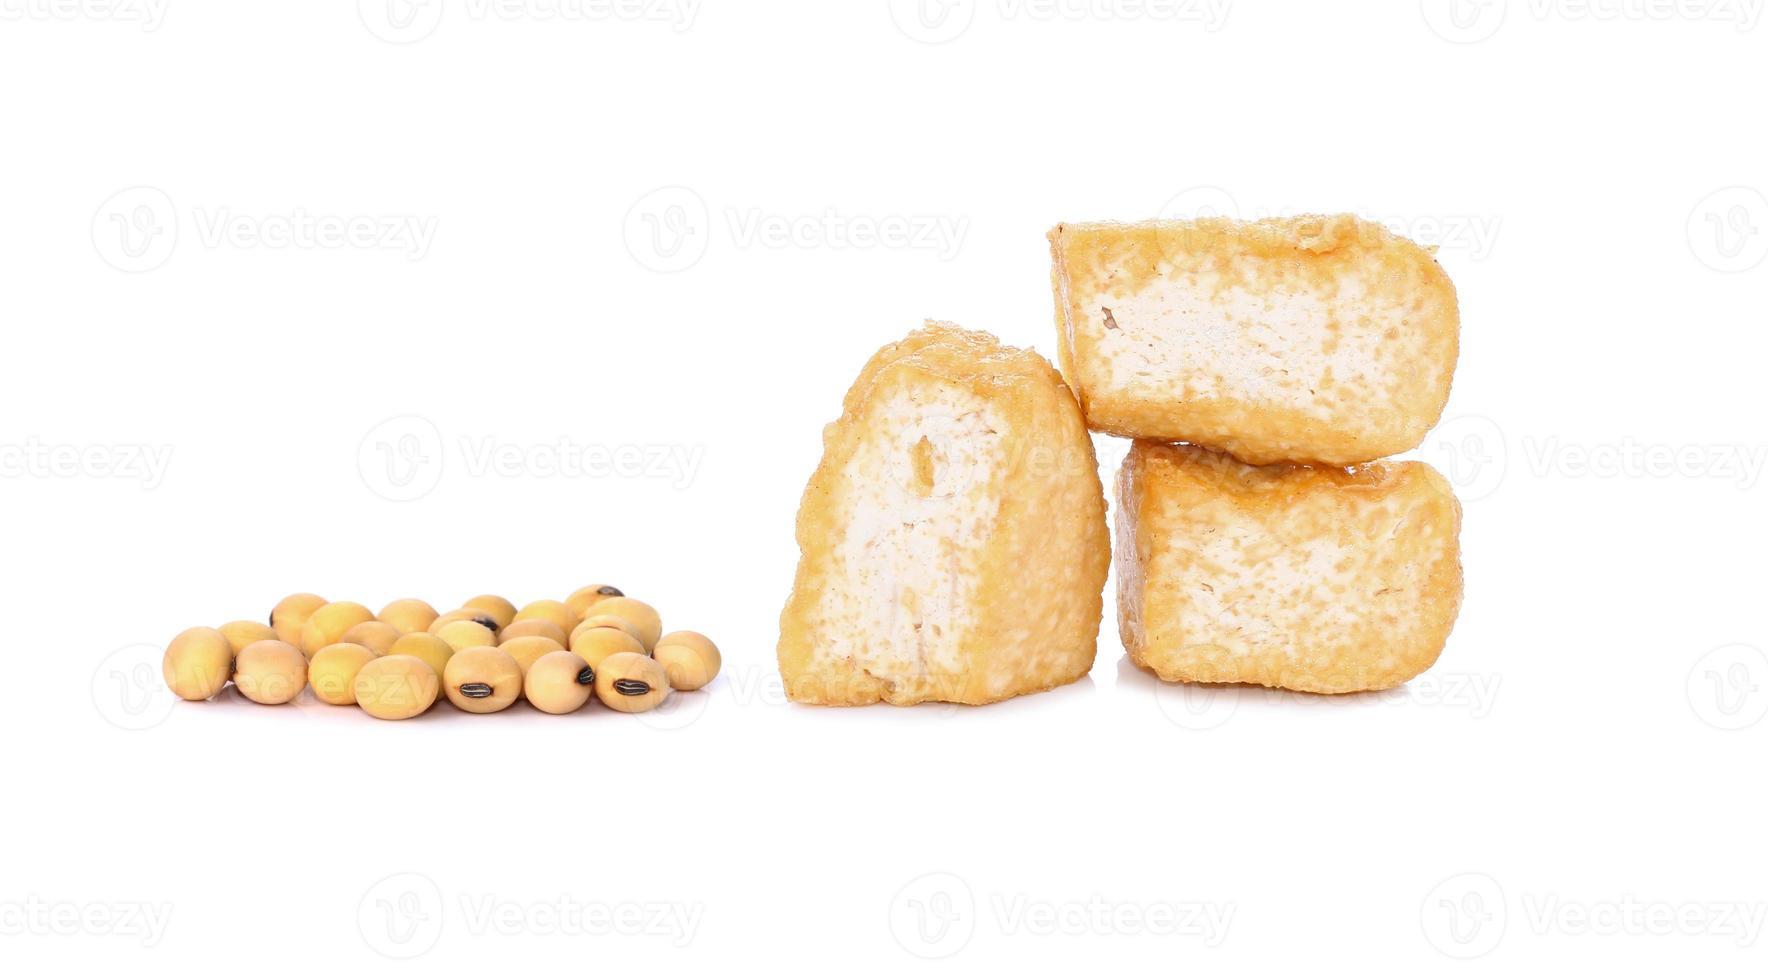 skivad bönor ostmassa tofu över vit bakgrund foto